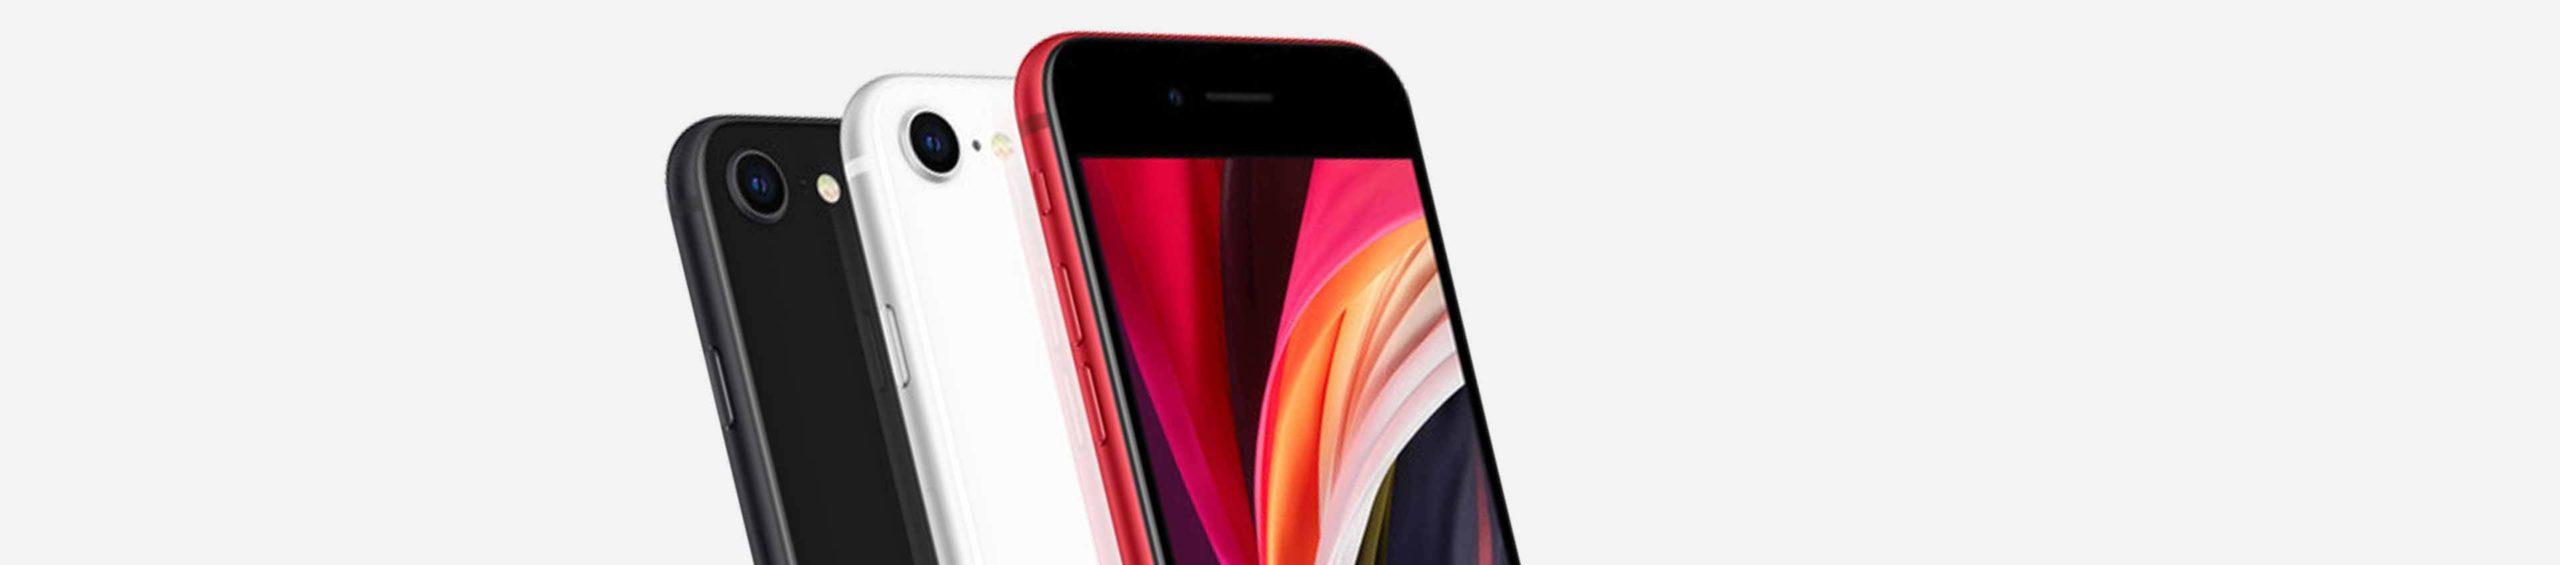 iPhone SE 2020 Black Friday